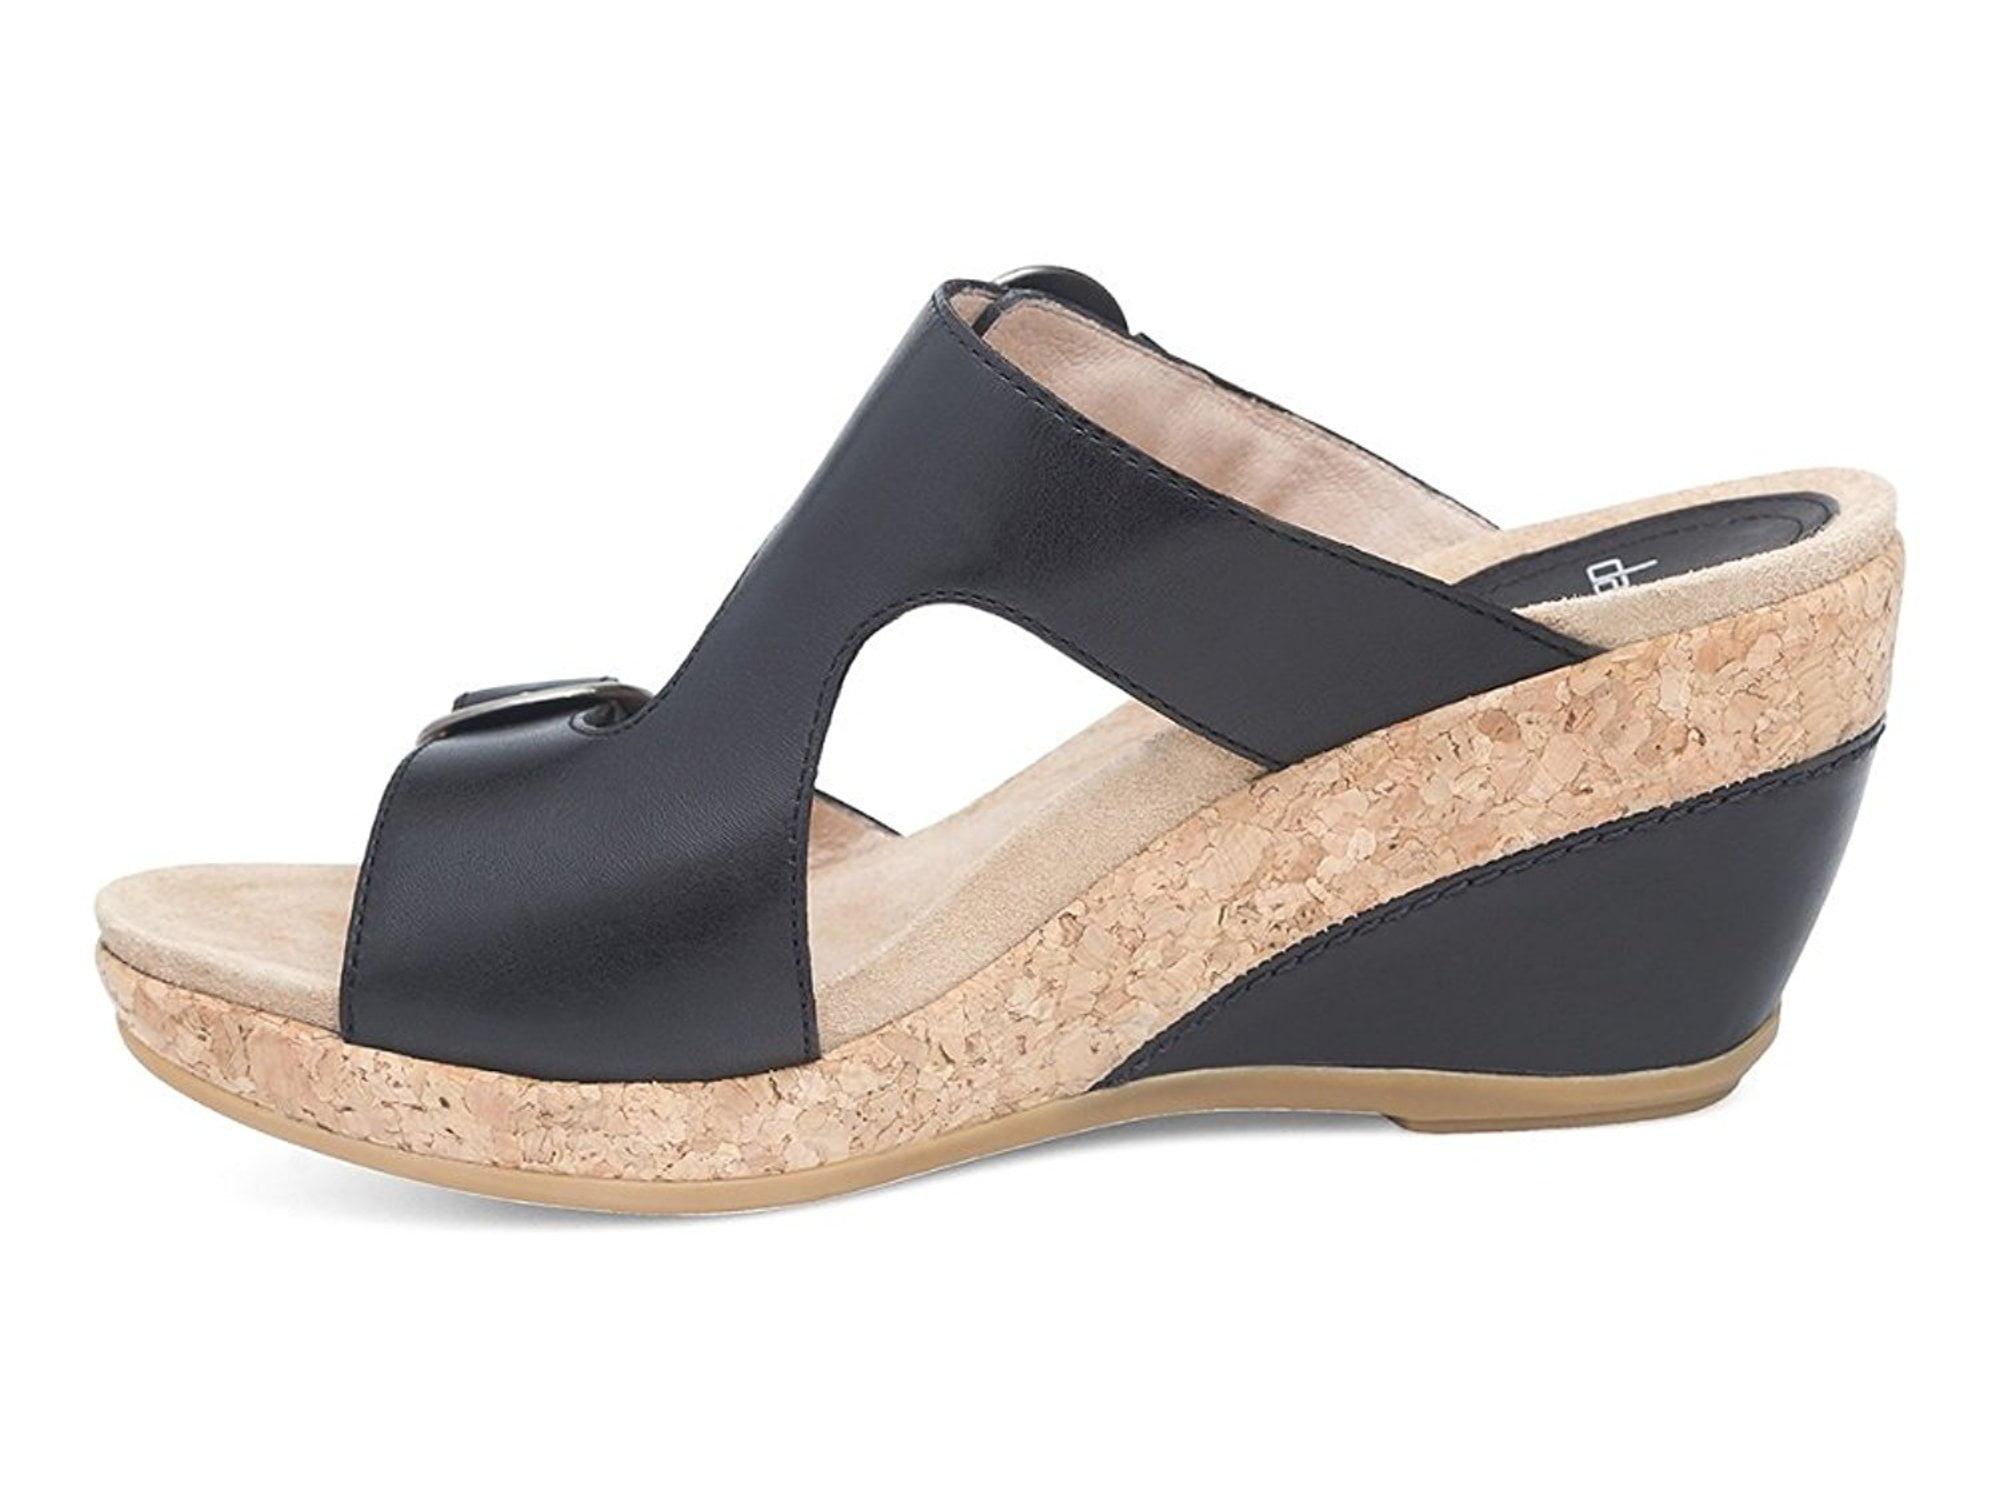 e896c49b298 Dansko Womens Carla Leather Open Toe Casual Platform Sandals